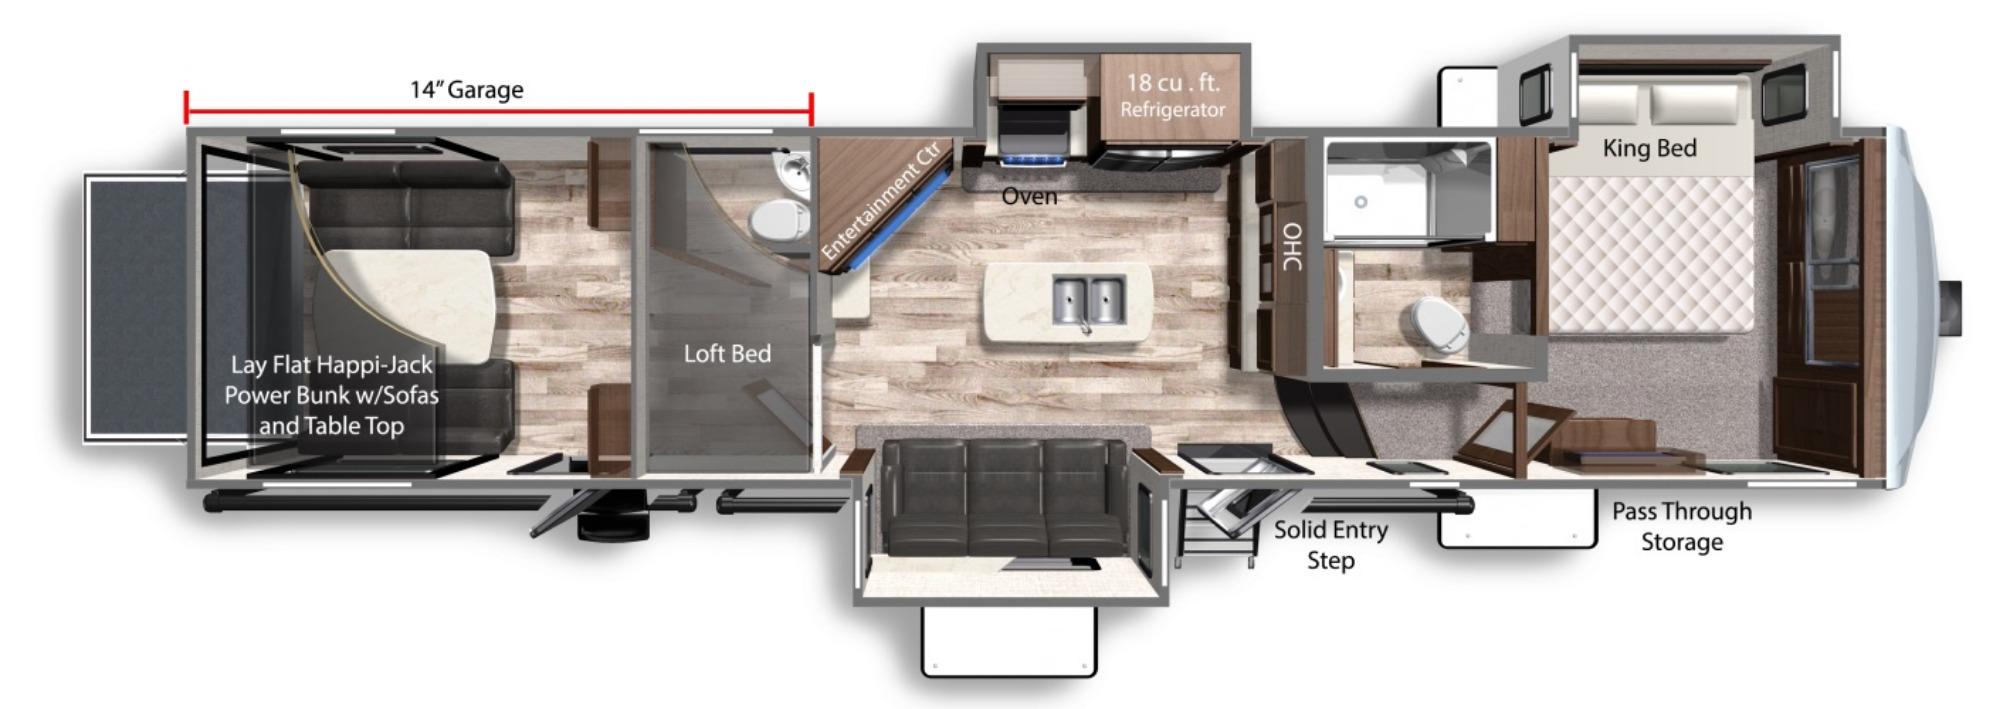 View Floor Plan for 2021 DUTCHMEN VOLTAGE 3845